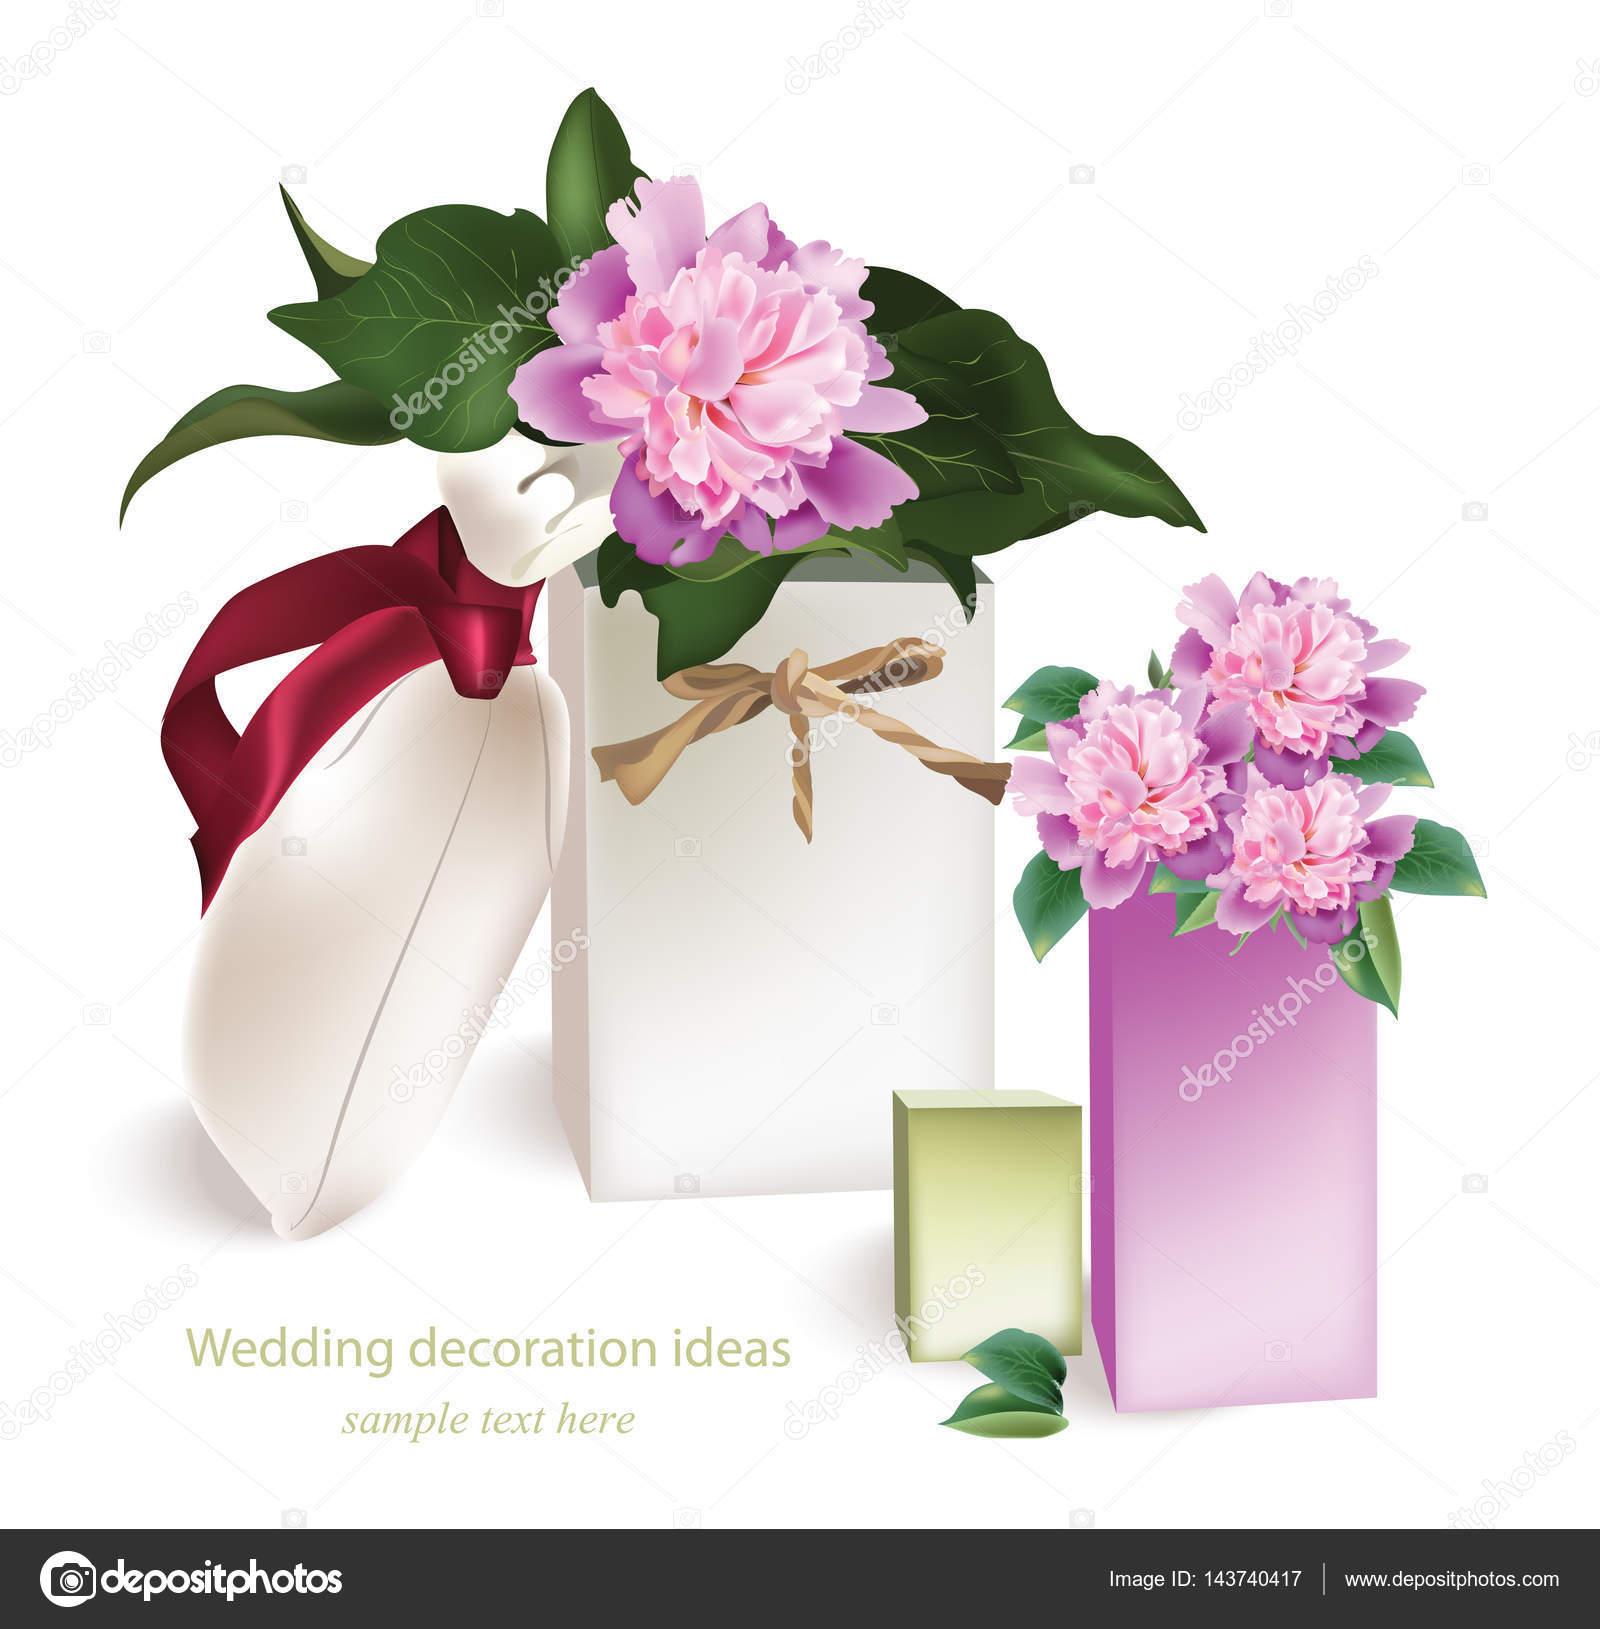 Disegni Anniversario Matrimonio Primavera Fiori Delicati